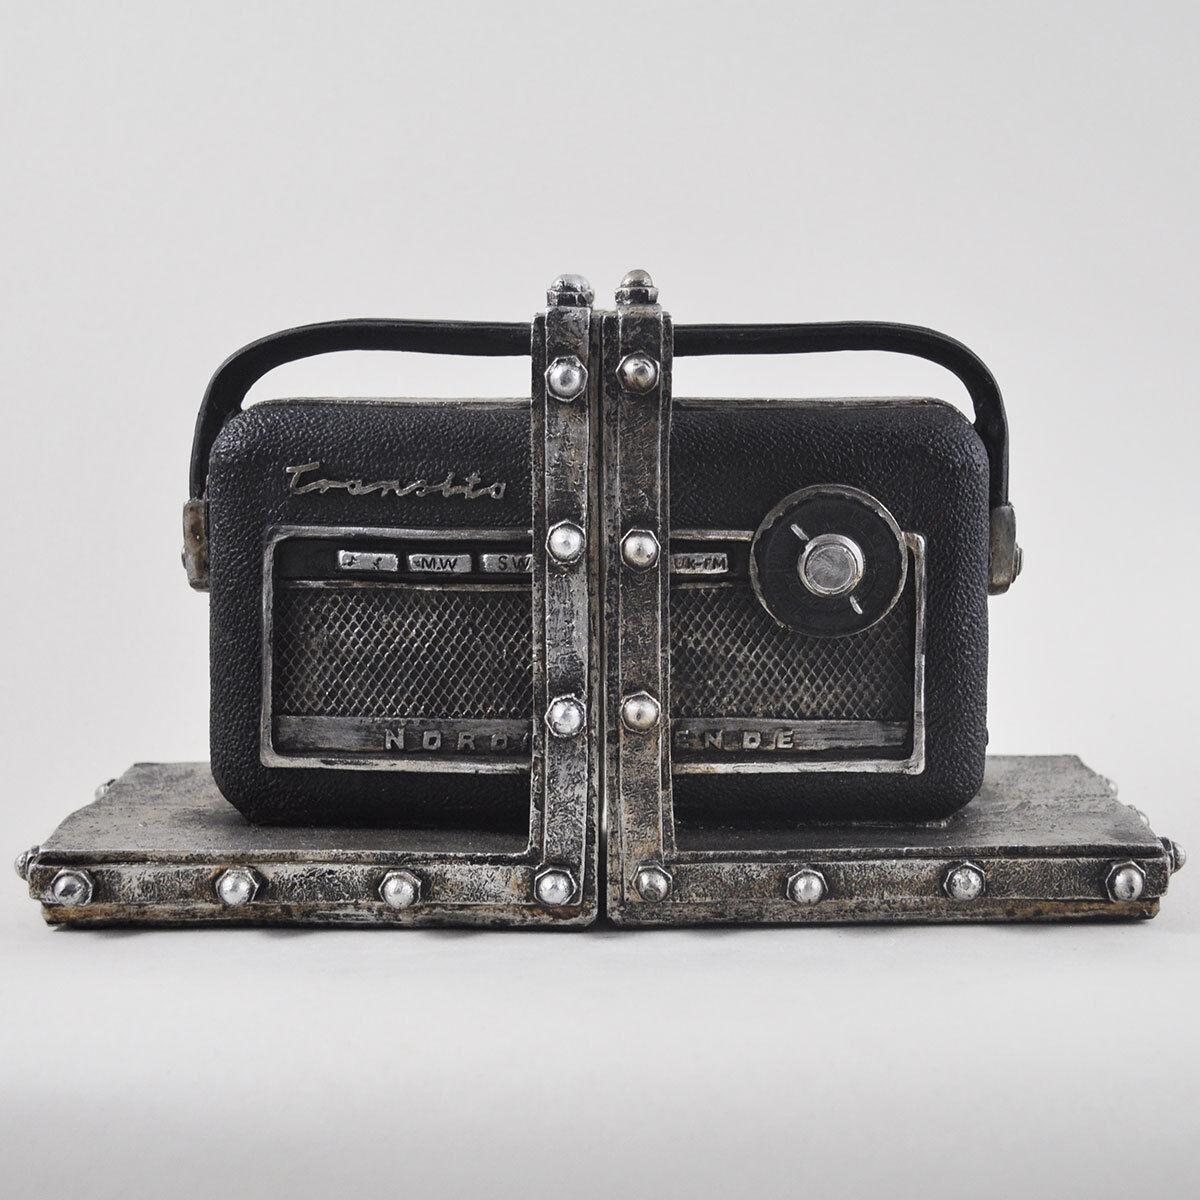 Vintage Nordmende Transistor Radio Themed Bookends.Sculpture   Figurine.New